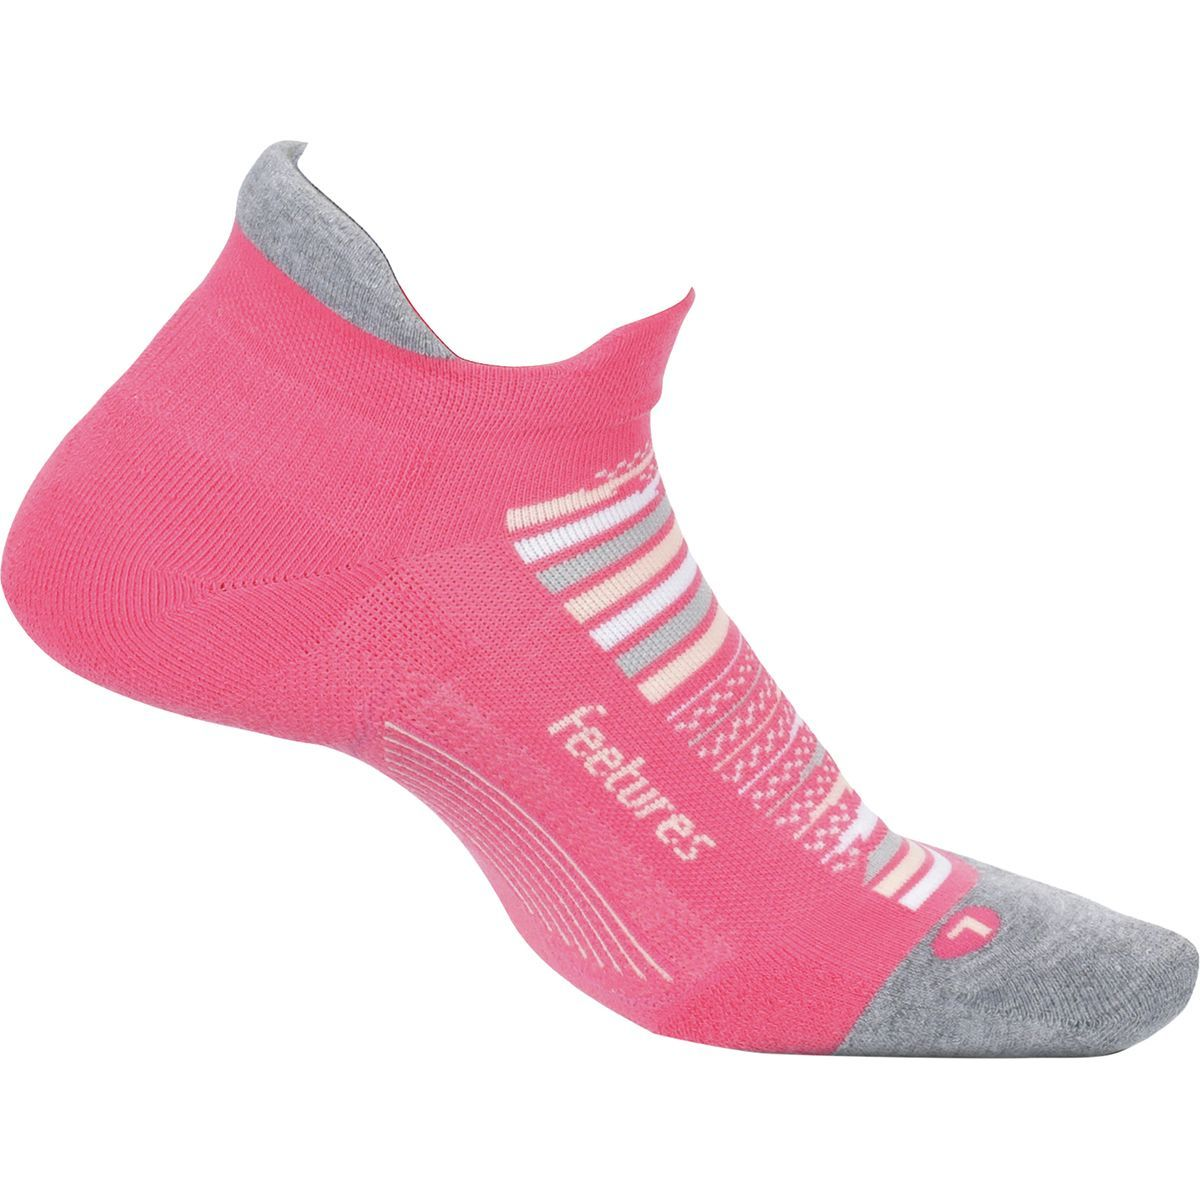 Feetures! Elite Max Cushion No Show Sock - Men's